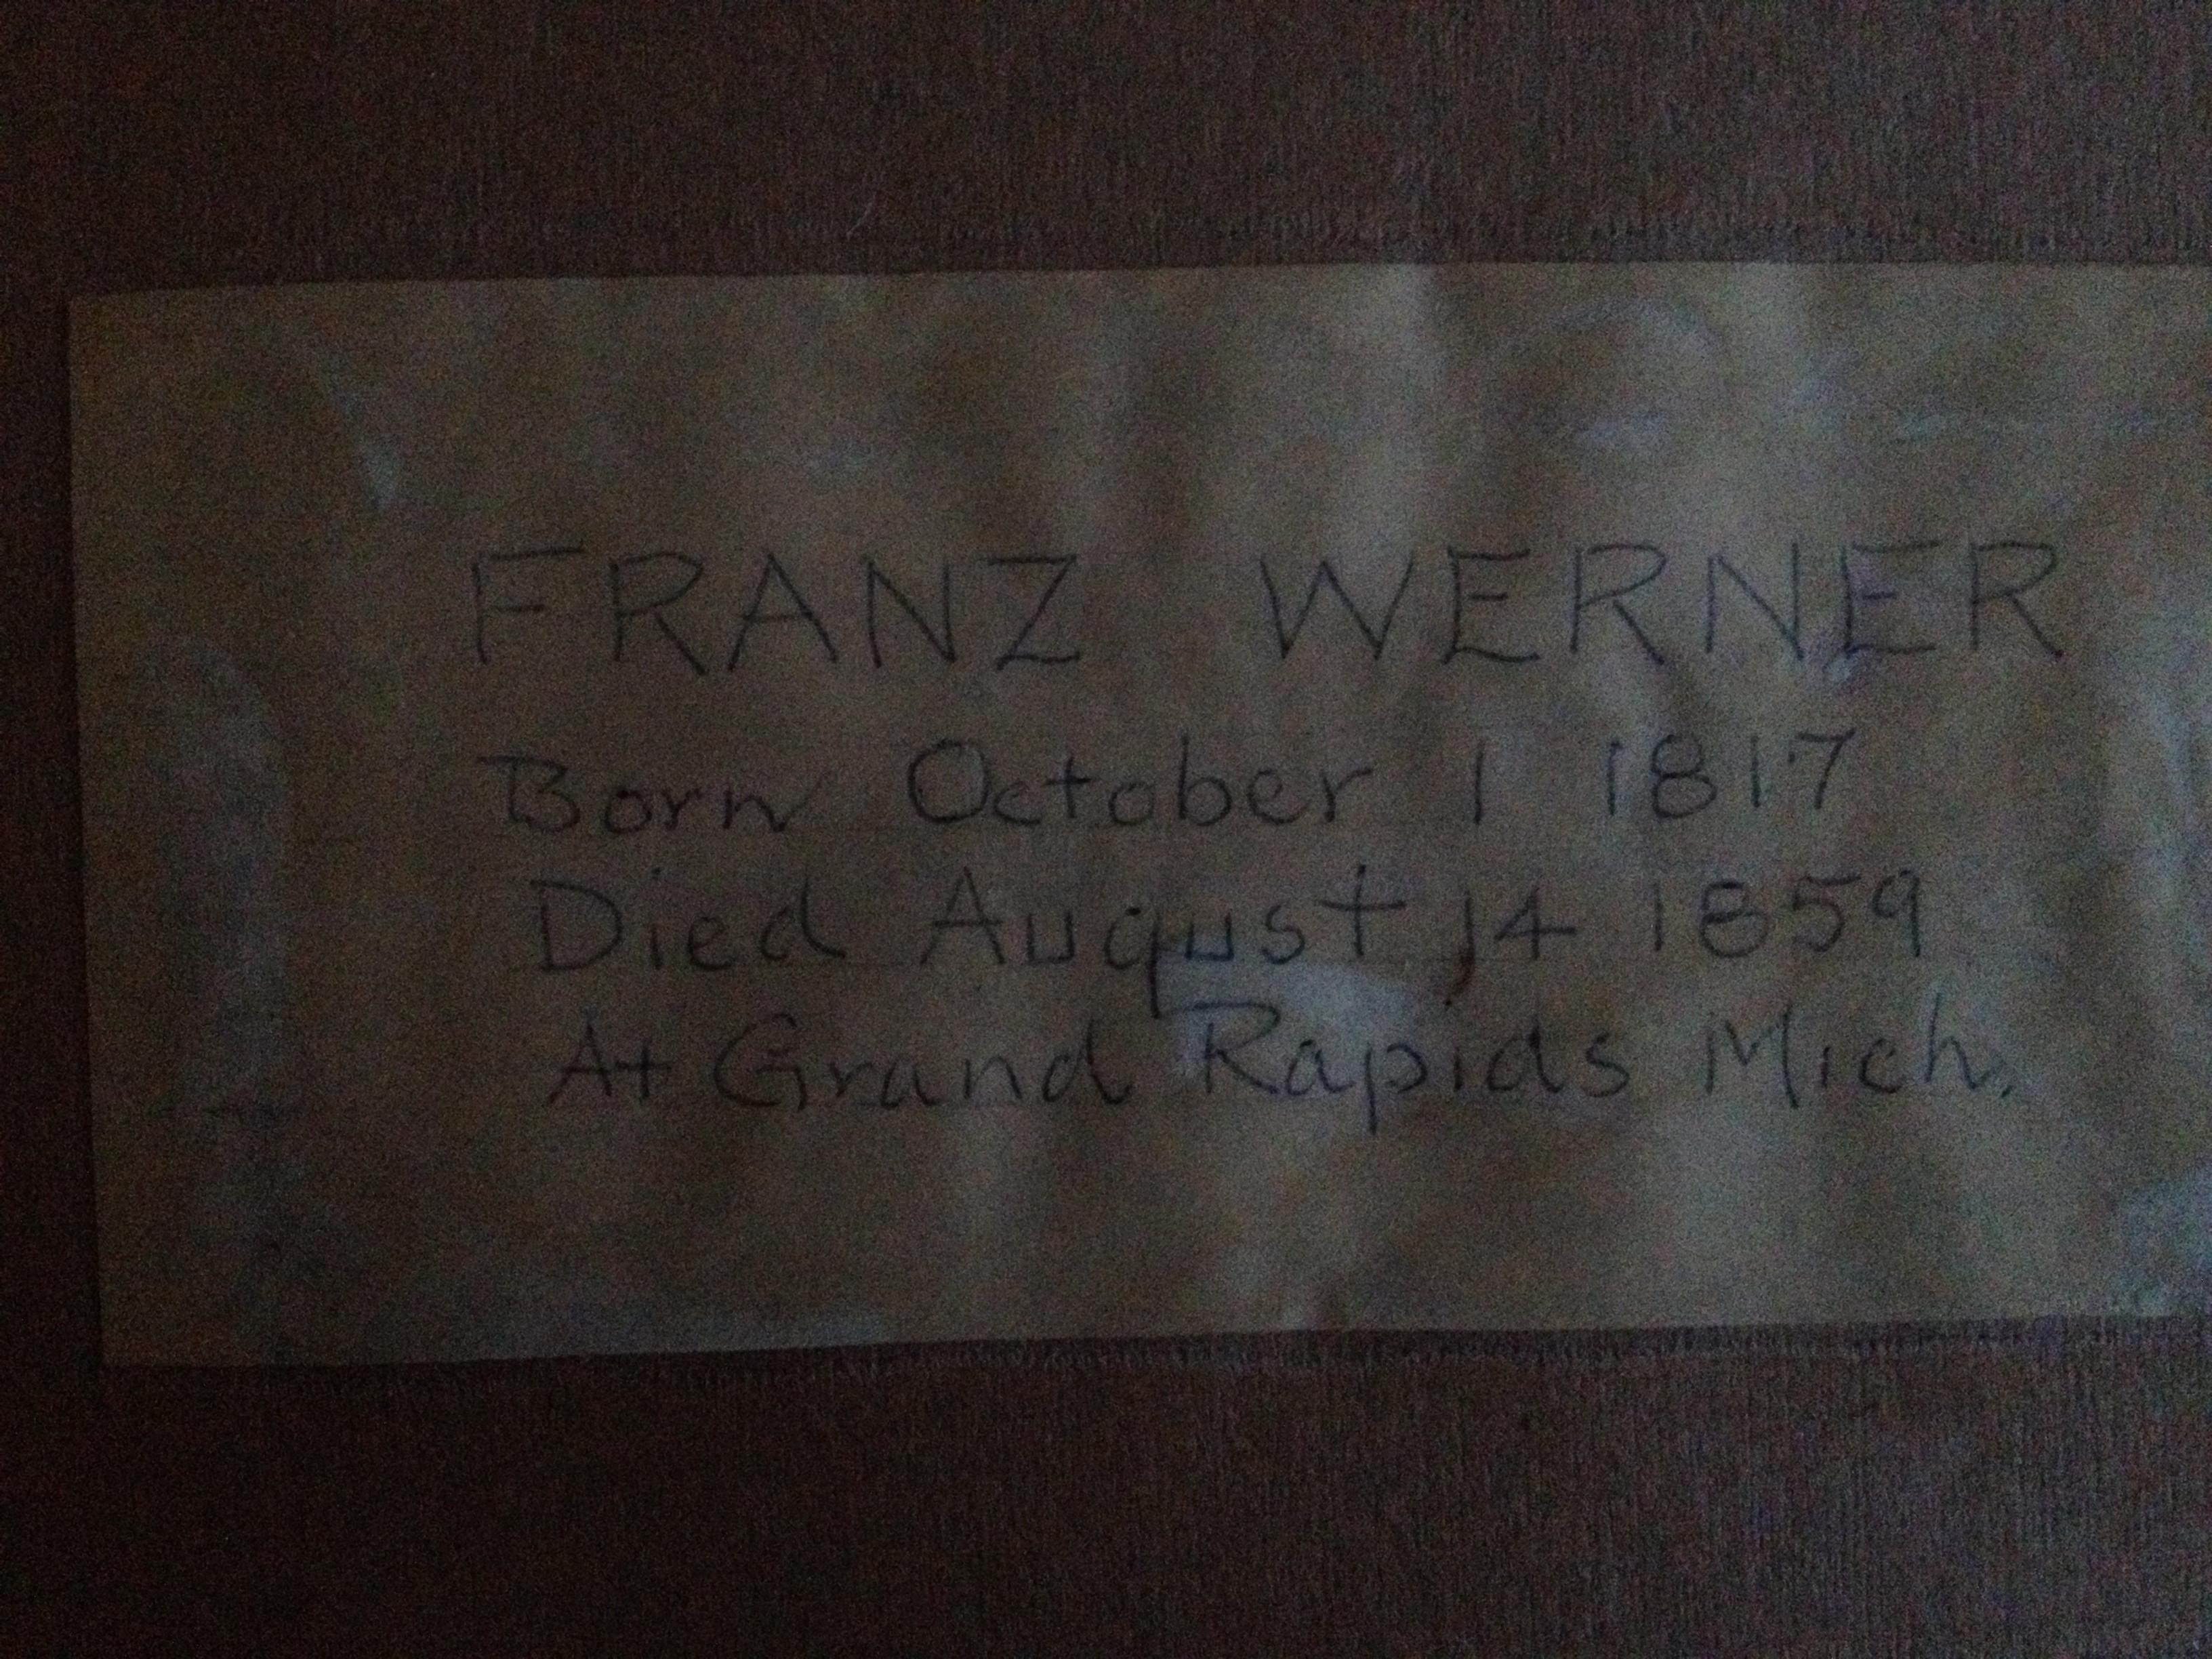 Francis Werner